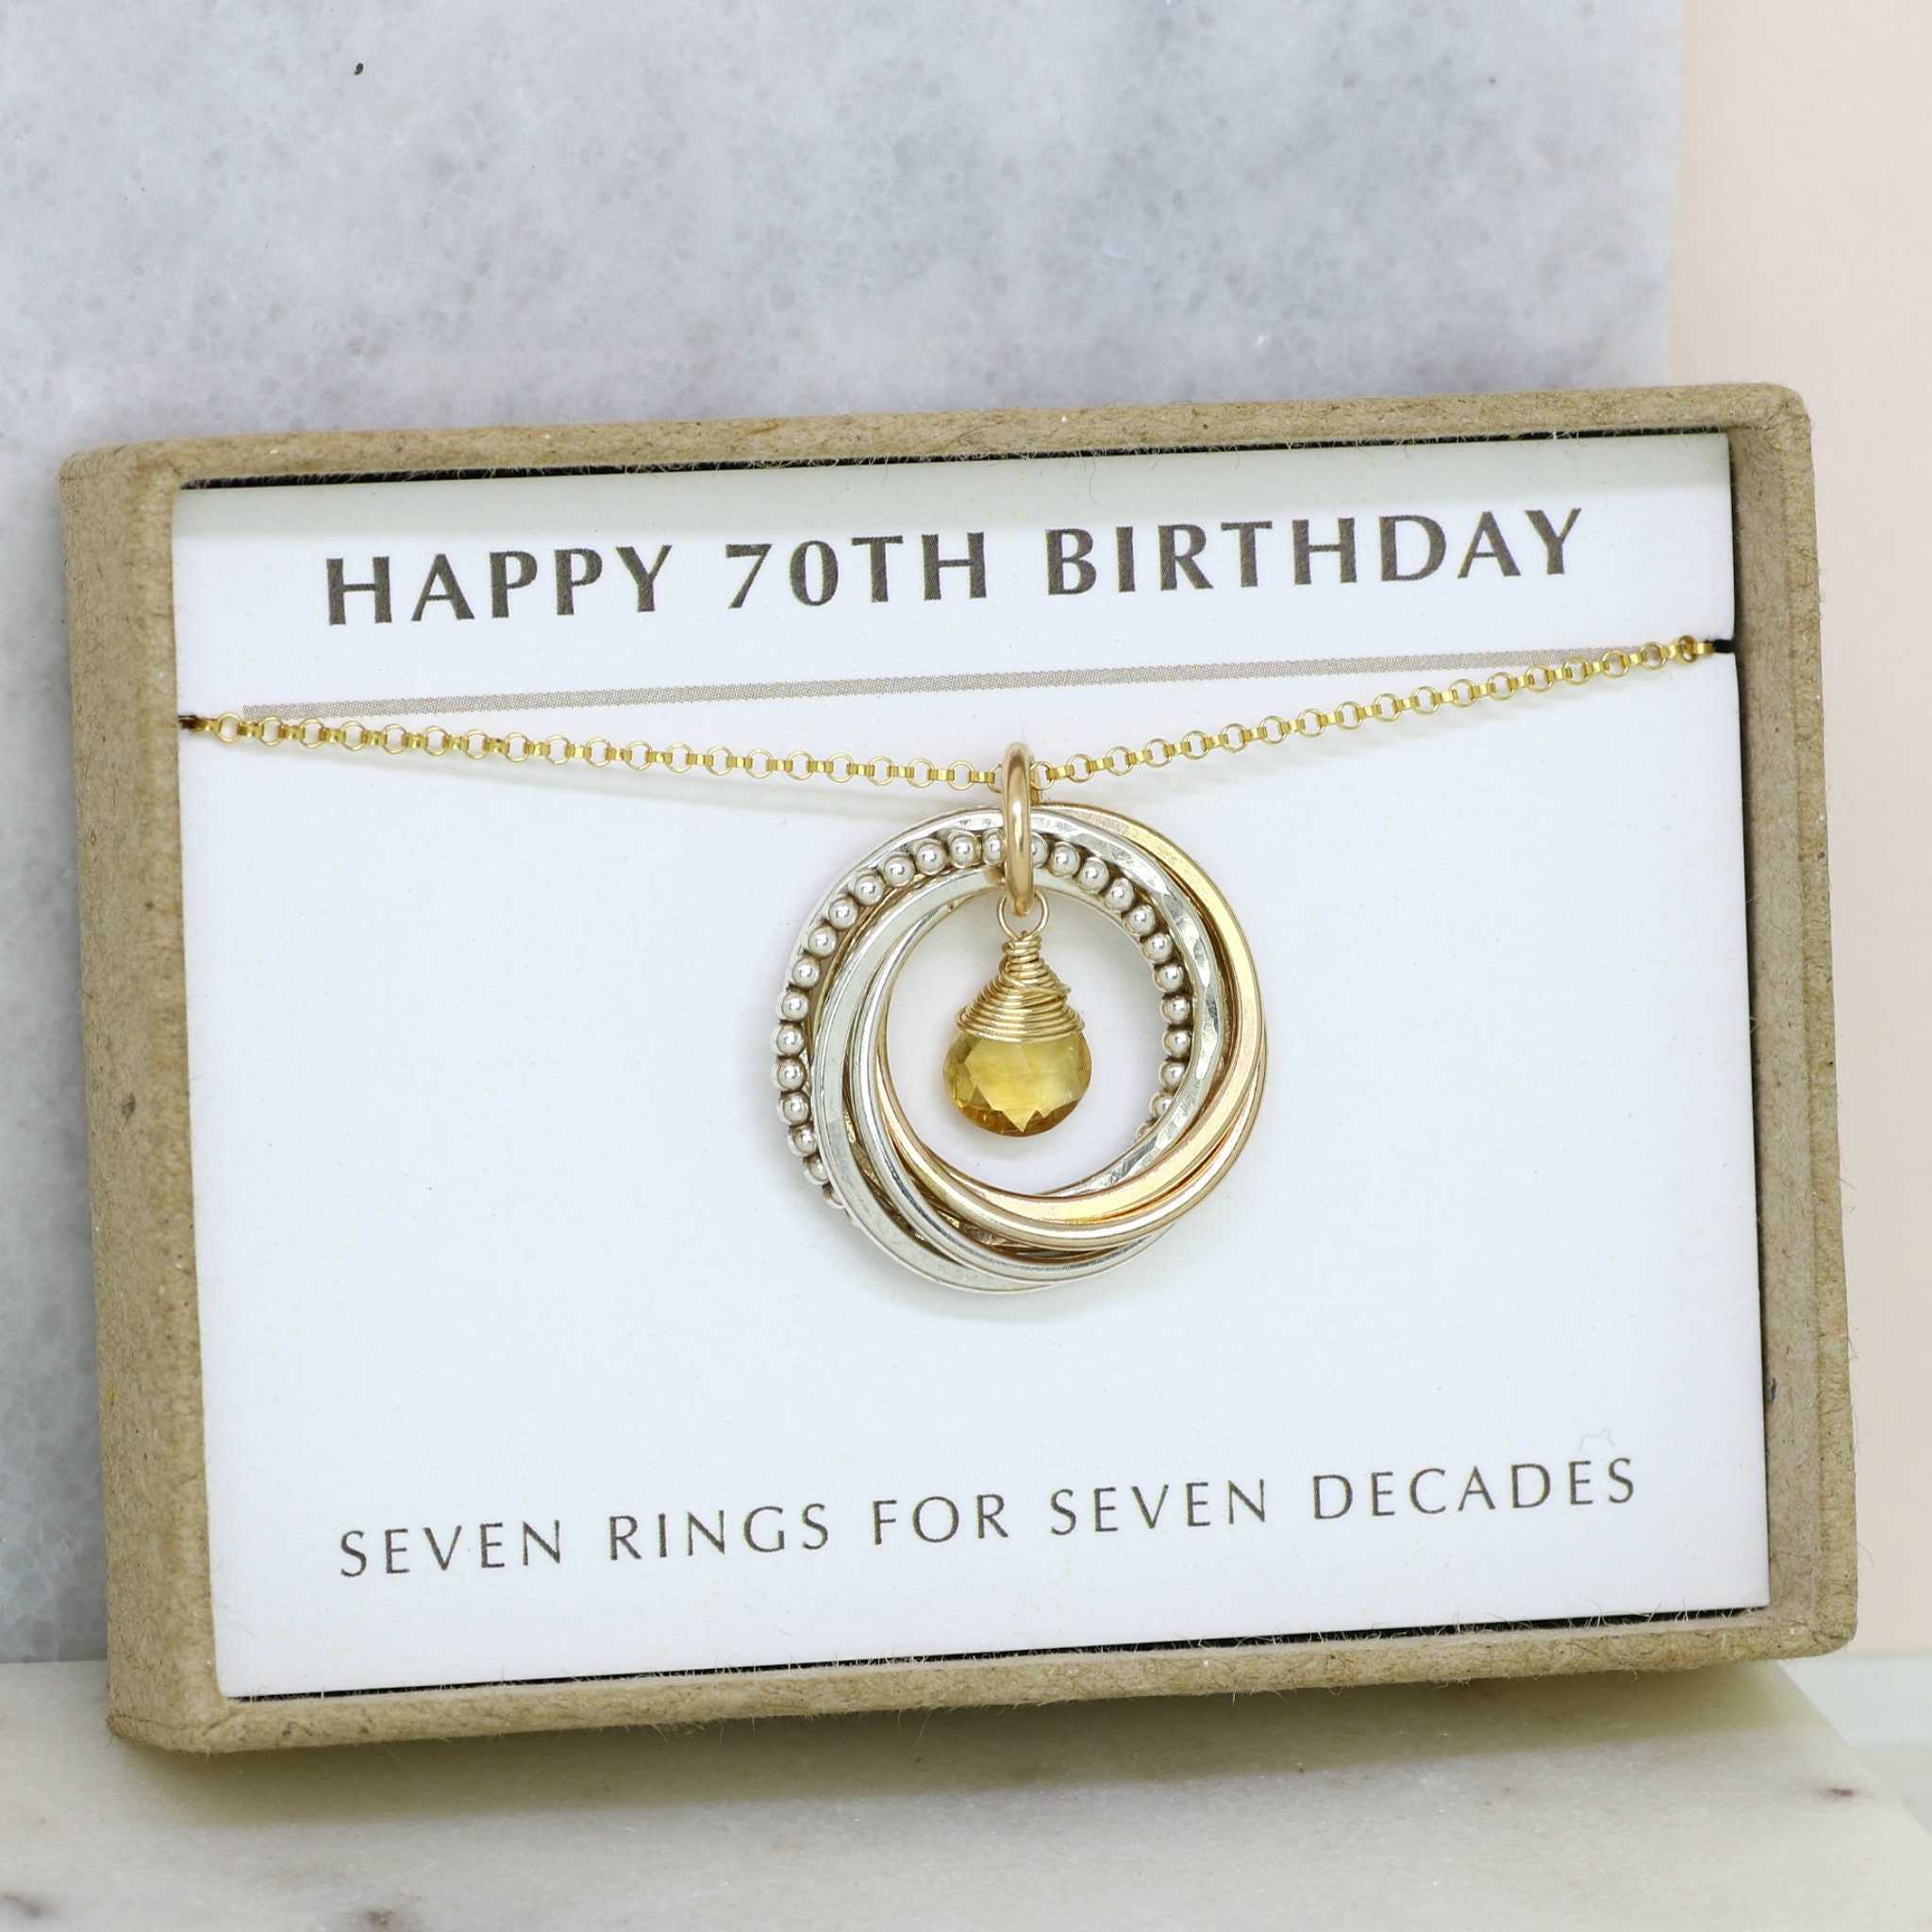 70th Birthday Gift November Birthstone Necklace Citrine For Grandma Mom